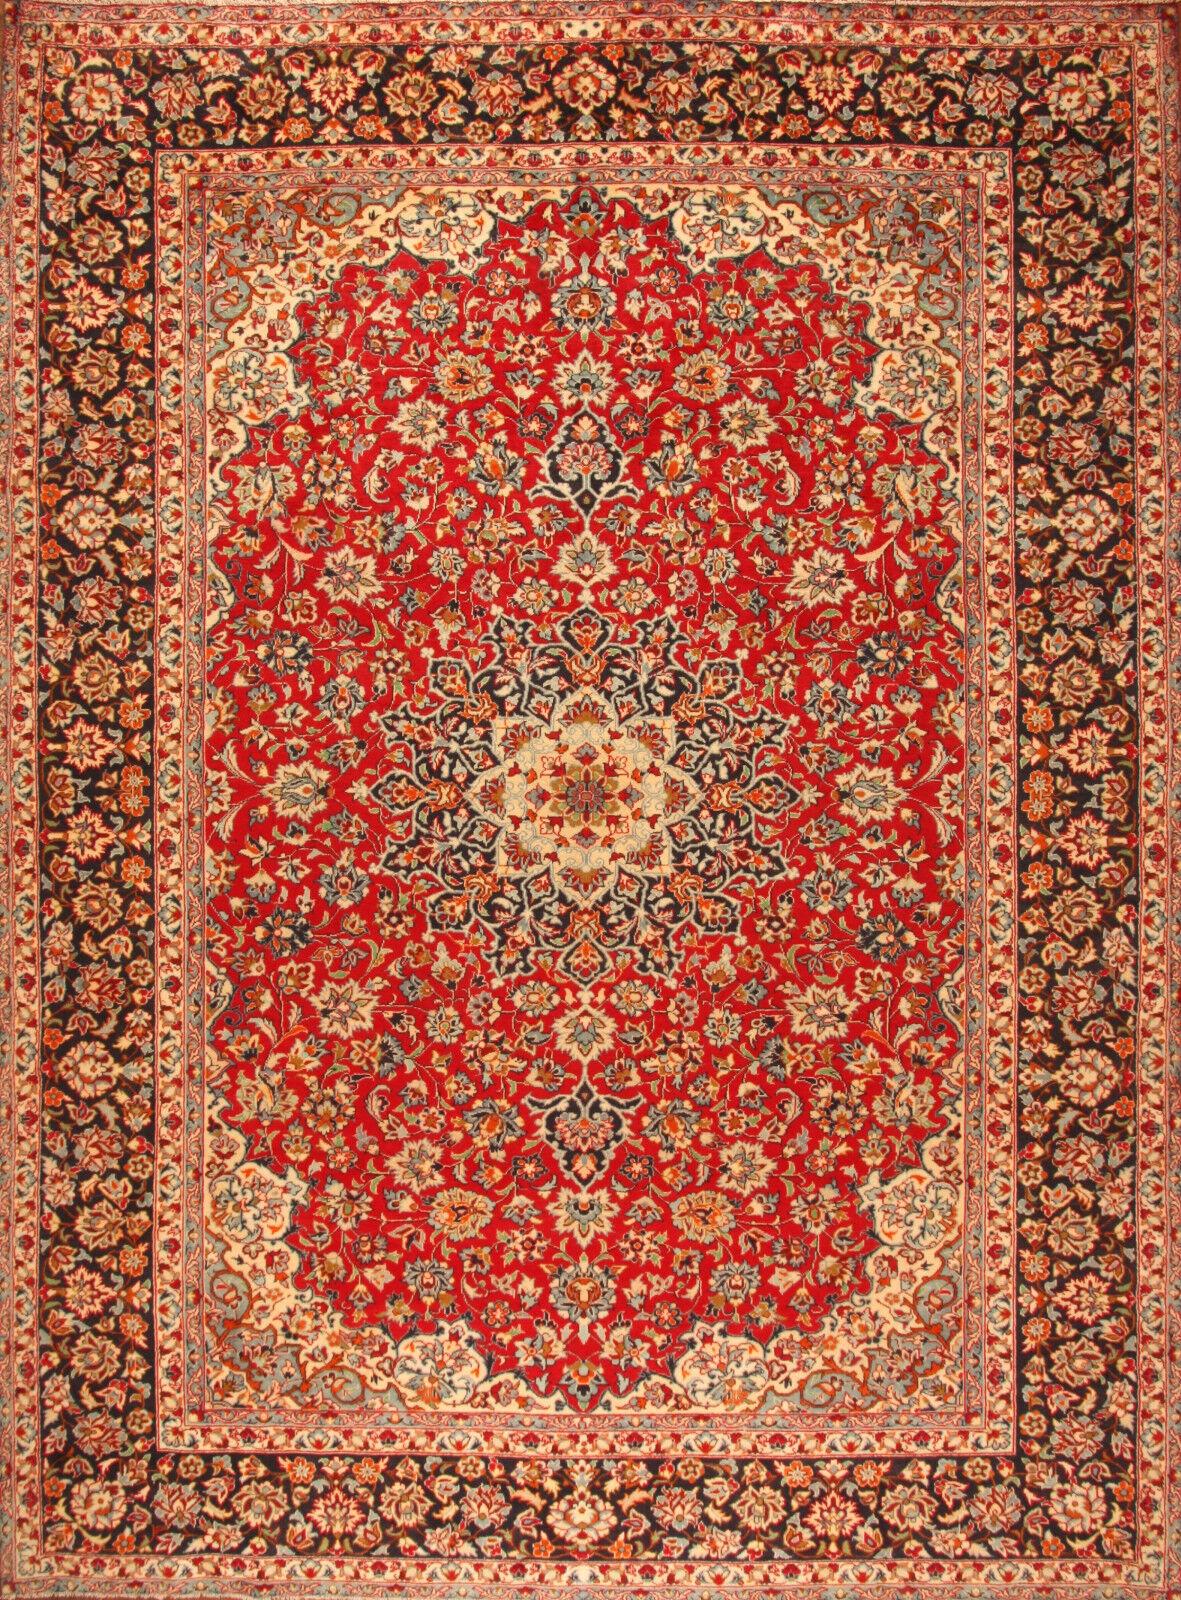 Orient alfombra verdadero hecha 3292 (400 x 295) cm top estado alfombra persa